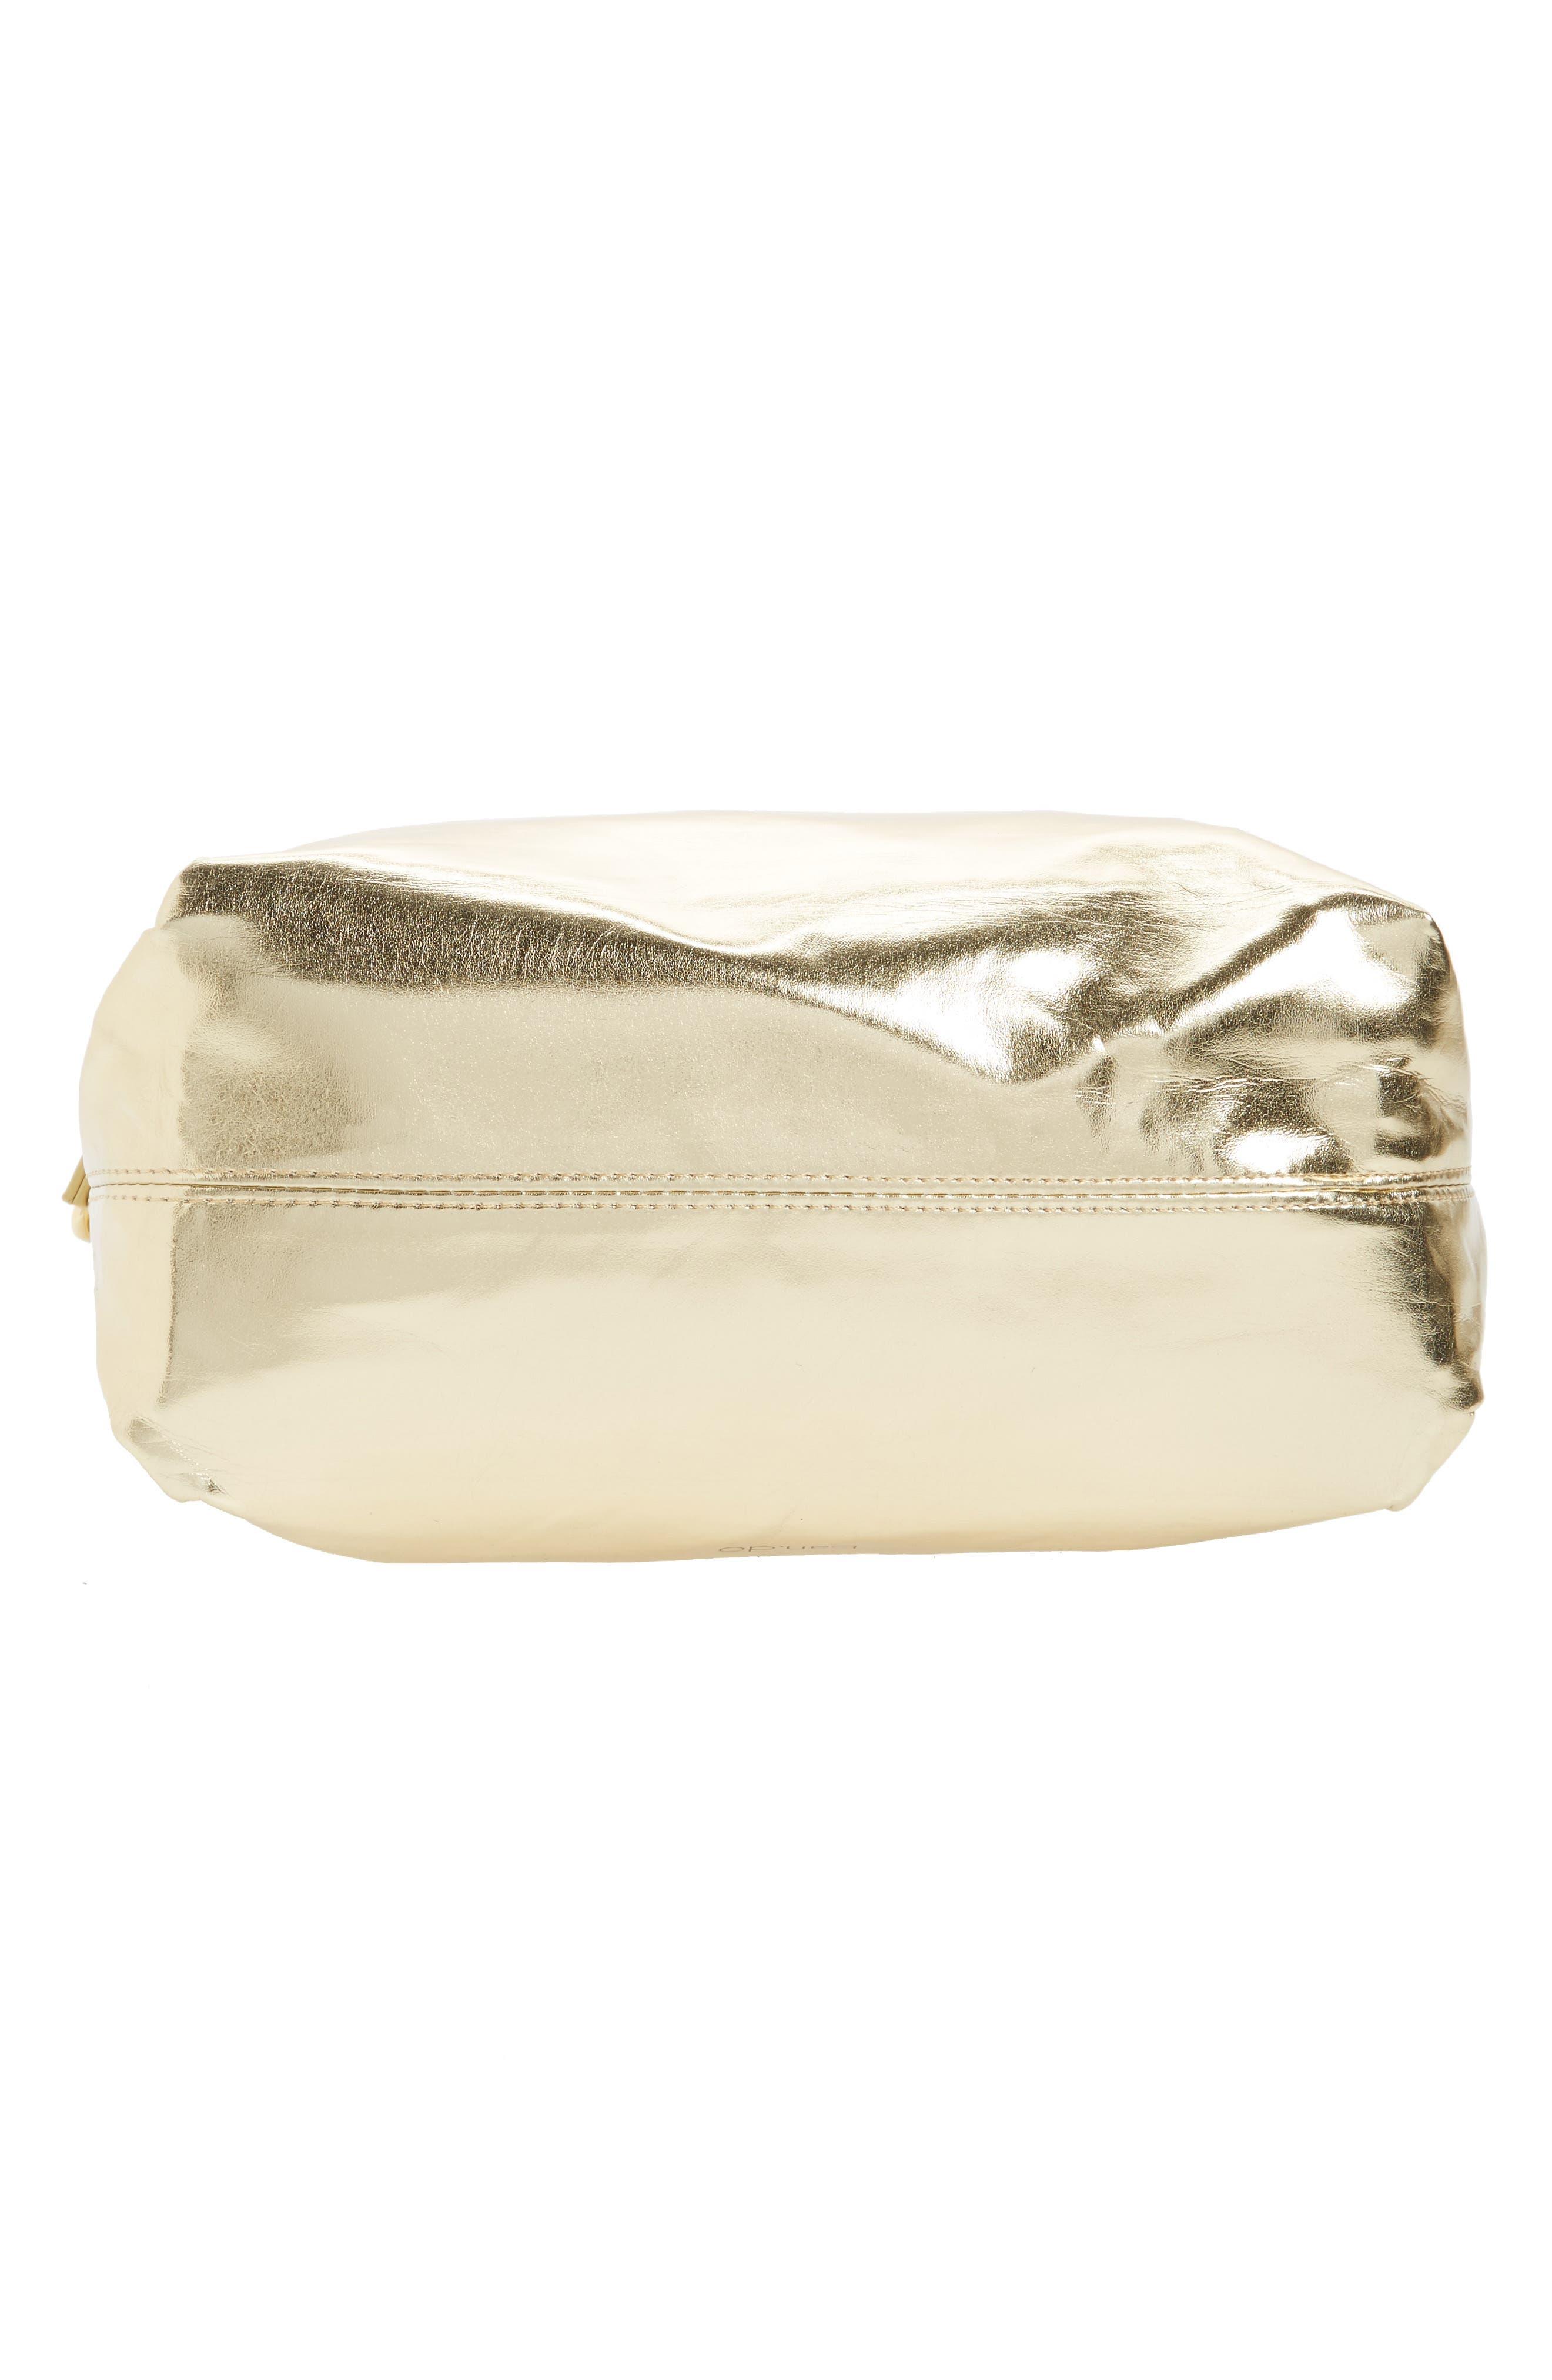 Crossbody Lunch Bag,                             Alternate thumbnail 6, color,                             Metallic Gold